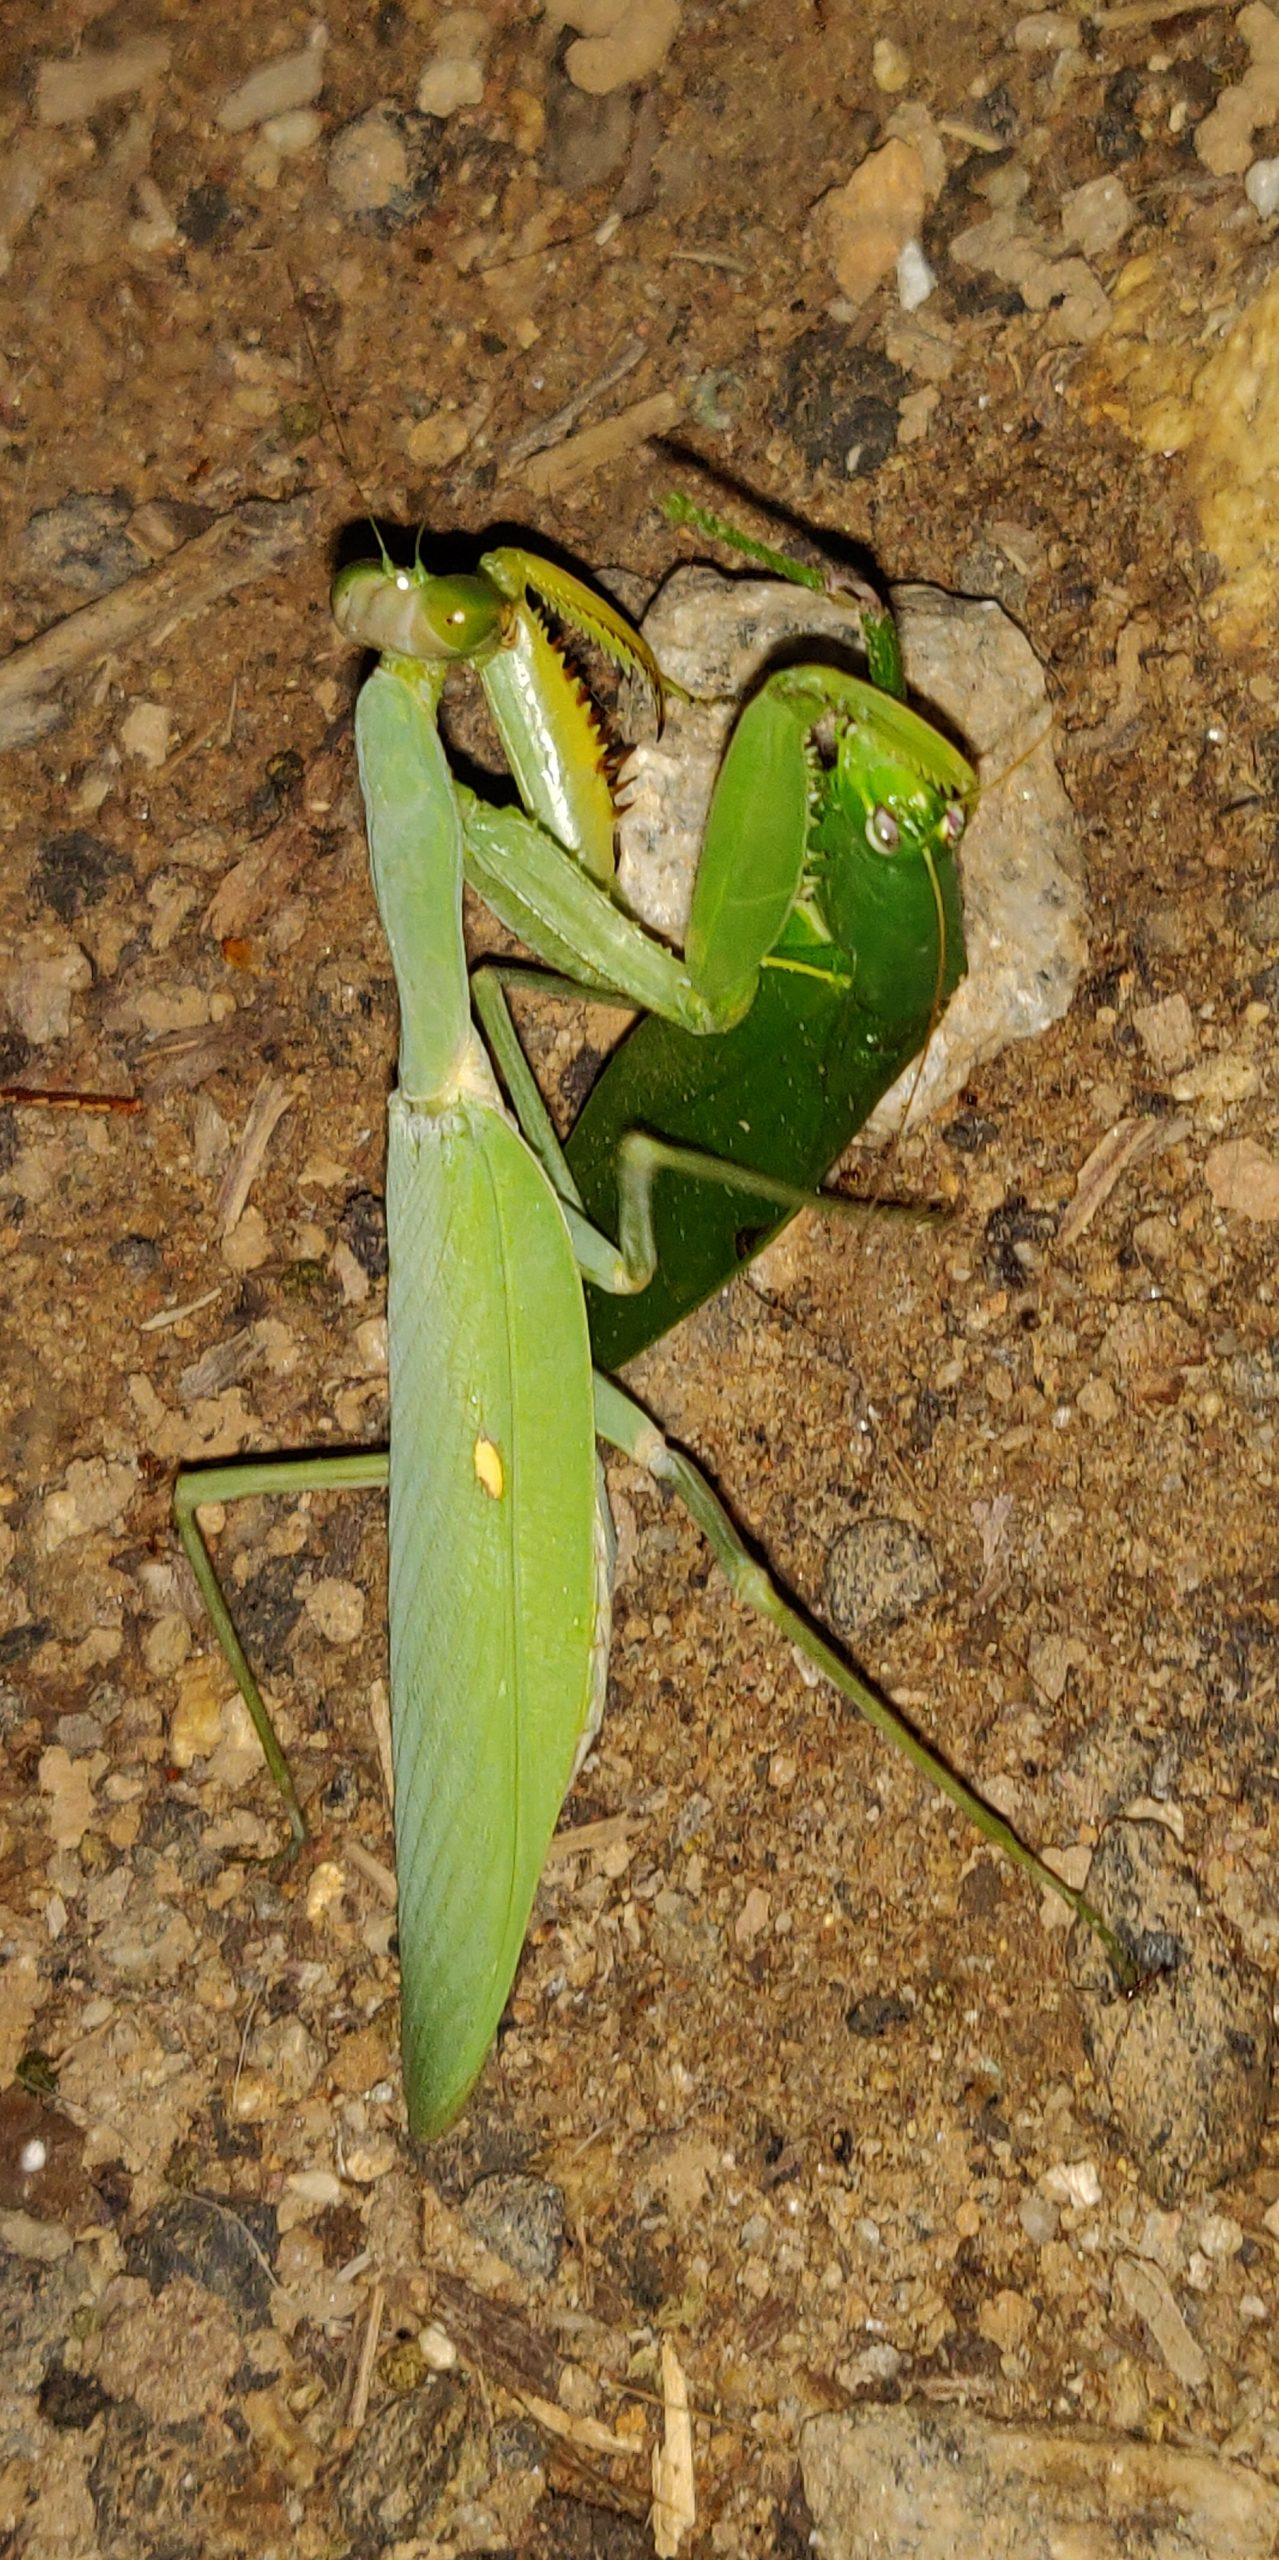 Grasshoppers on ground